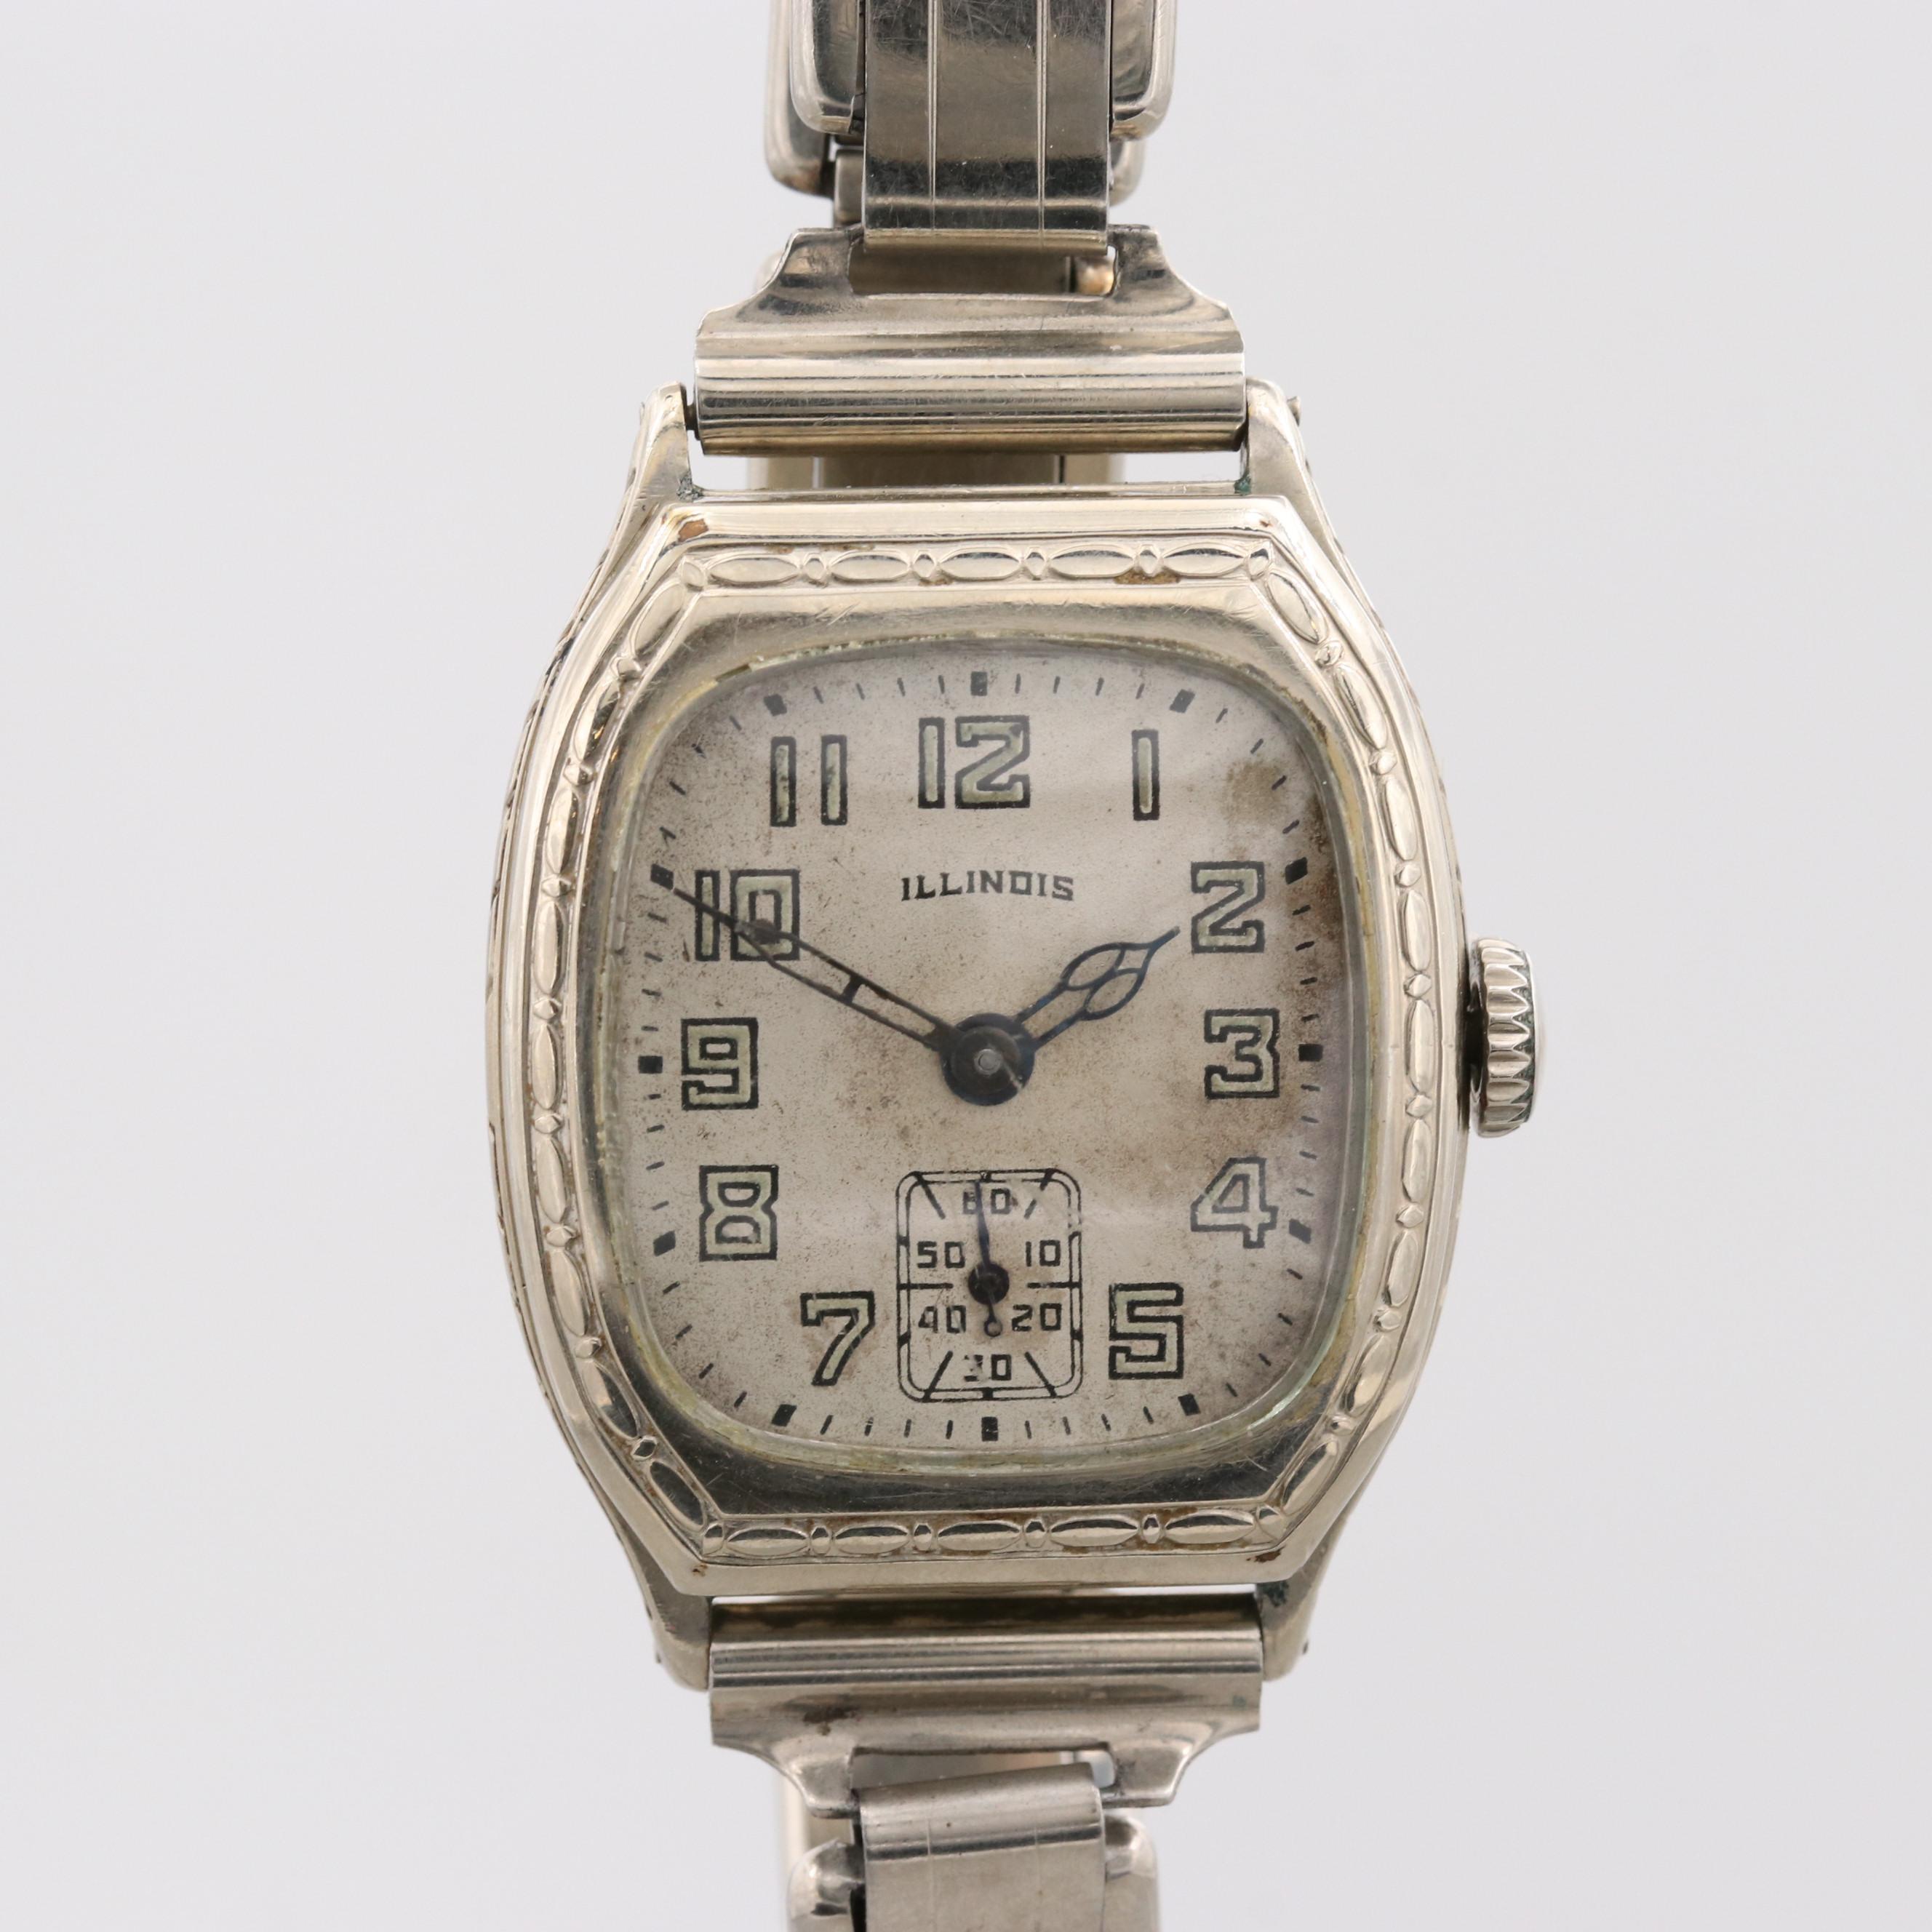 Vintage Illinois 14K White Gold Filled Wristwatch, 1930